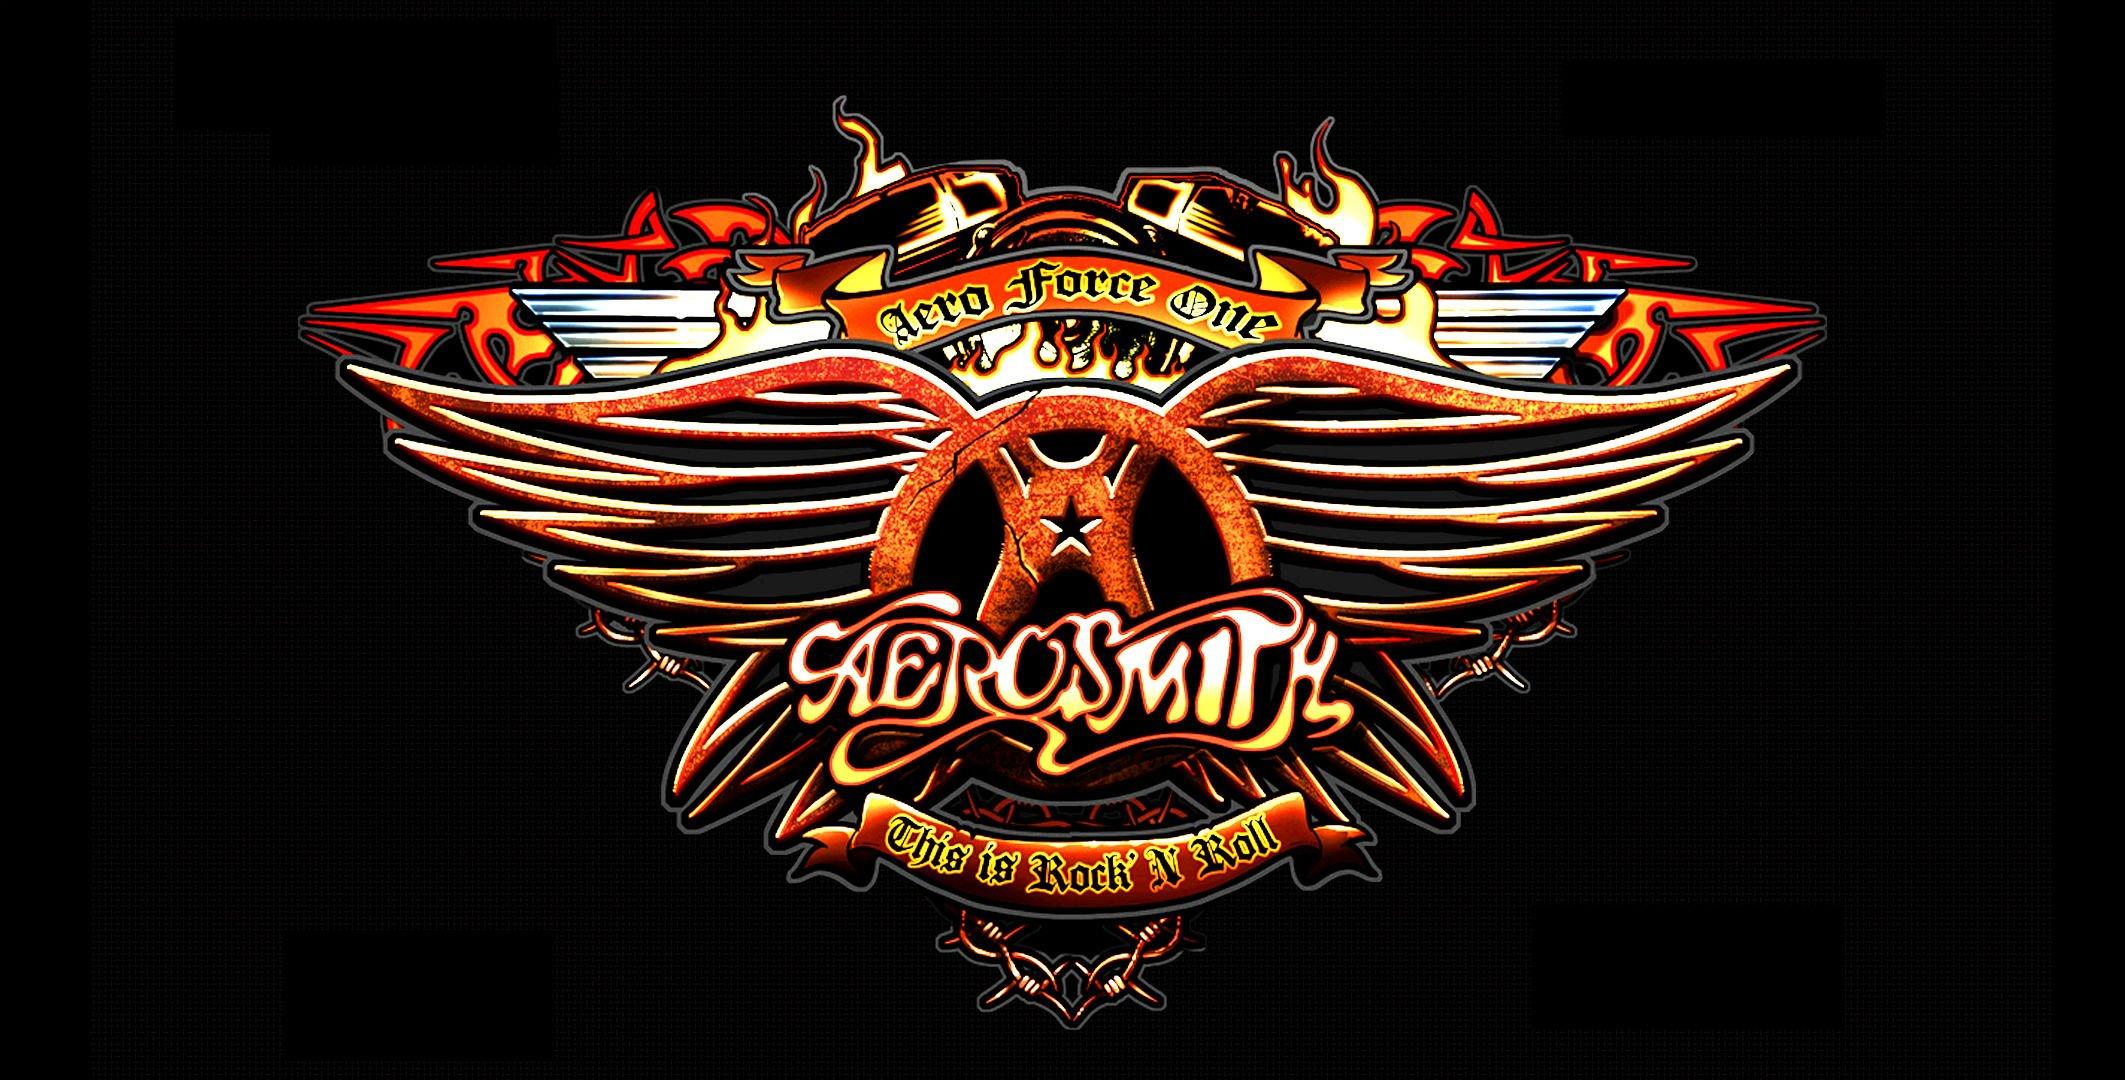 AEROSMITH Hard Rock Glam Heavy Metal Wallpaper